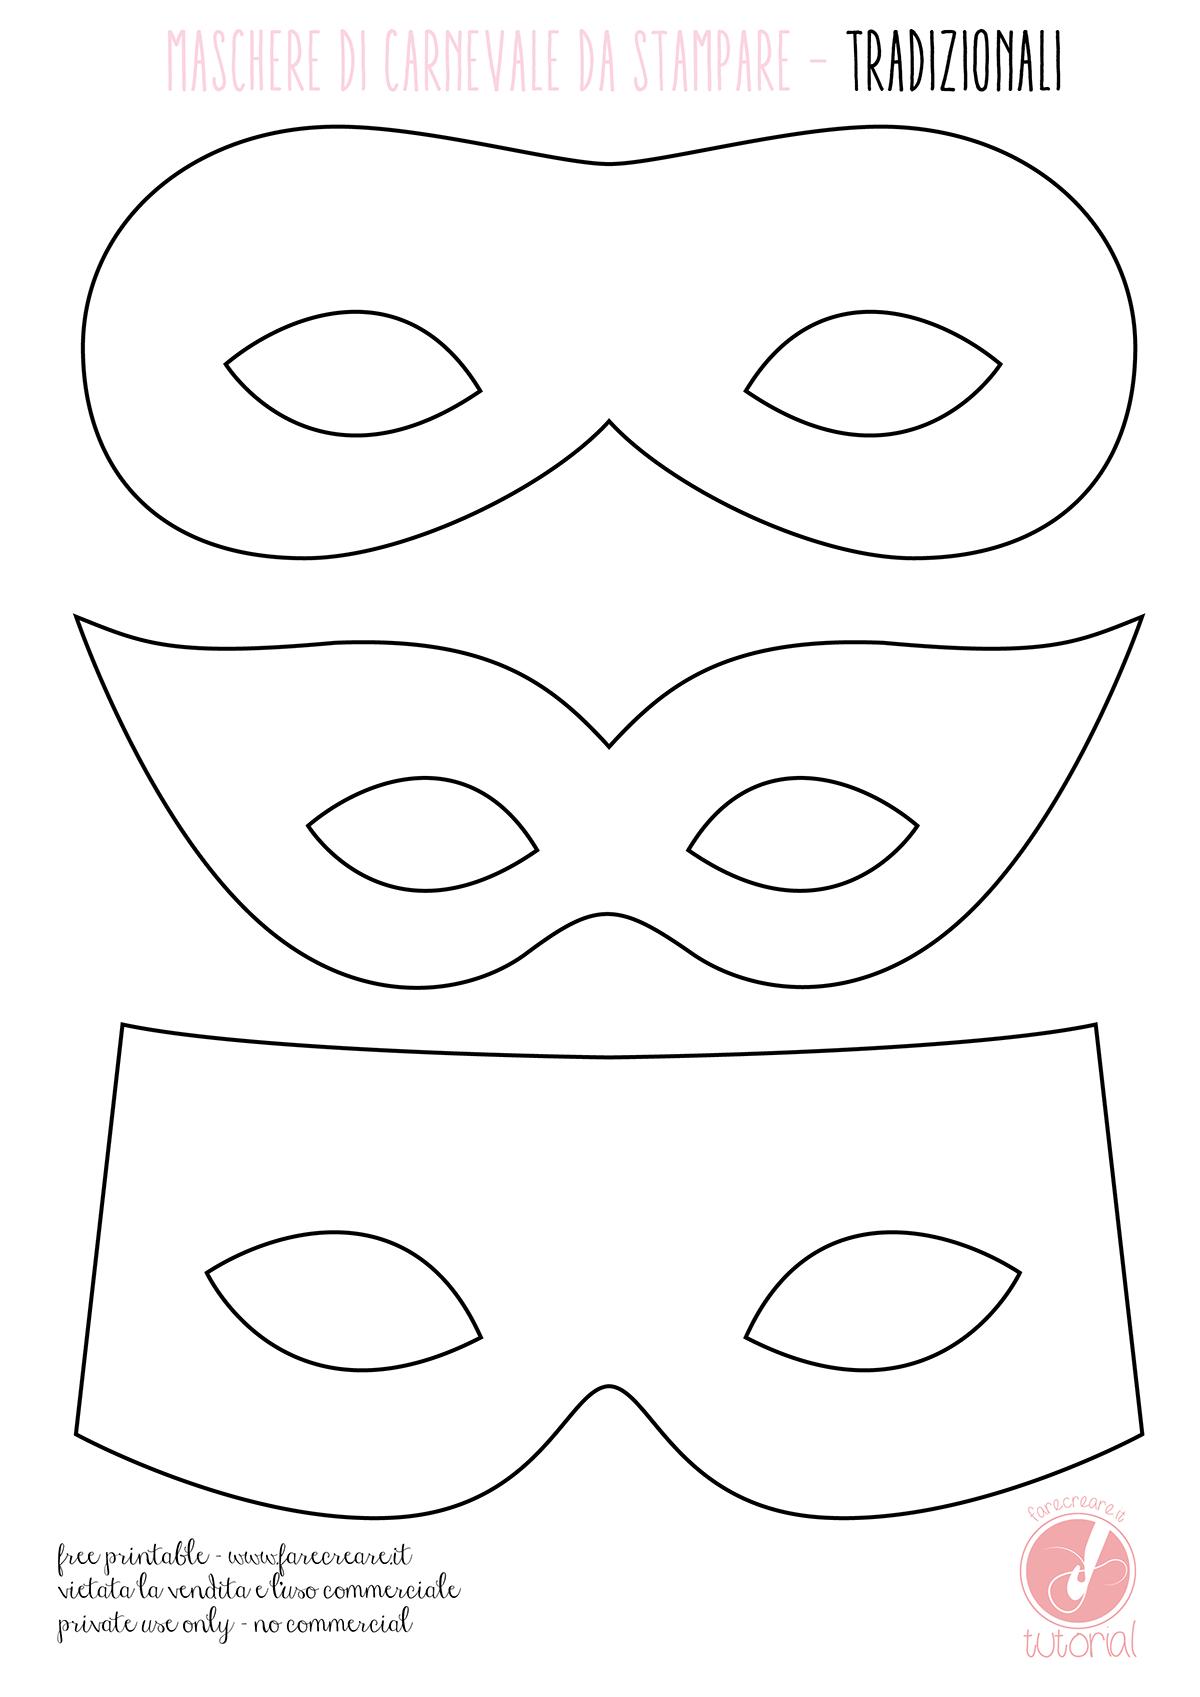 Maschere di carnevale da colorare tradizionali for Maschere di animali di carnevale da colorare